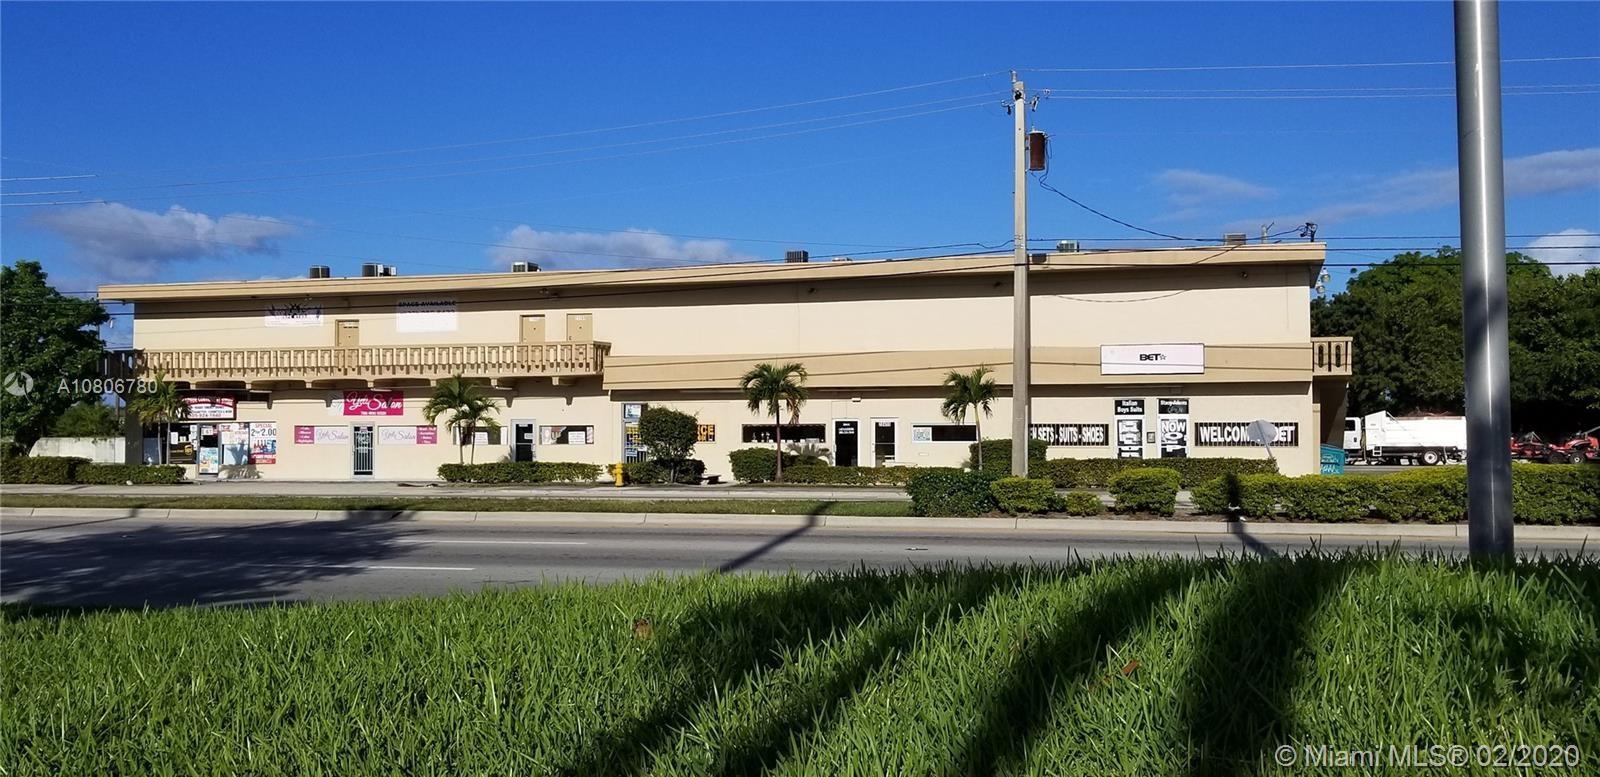 20464 S Dixie Hwy, Cutler Bay, FL 33189